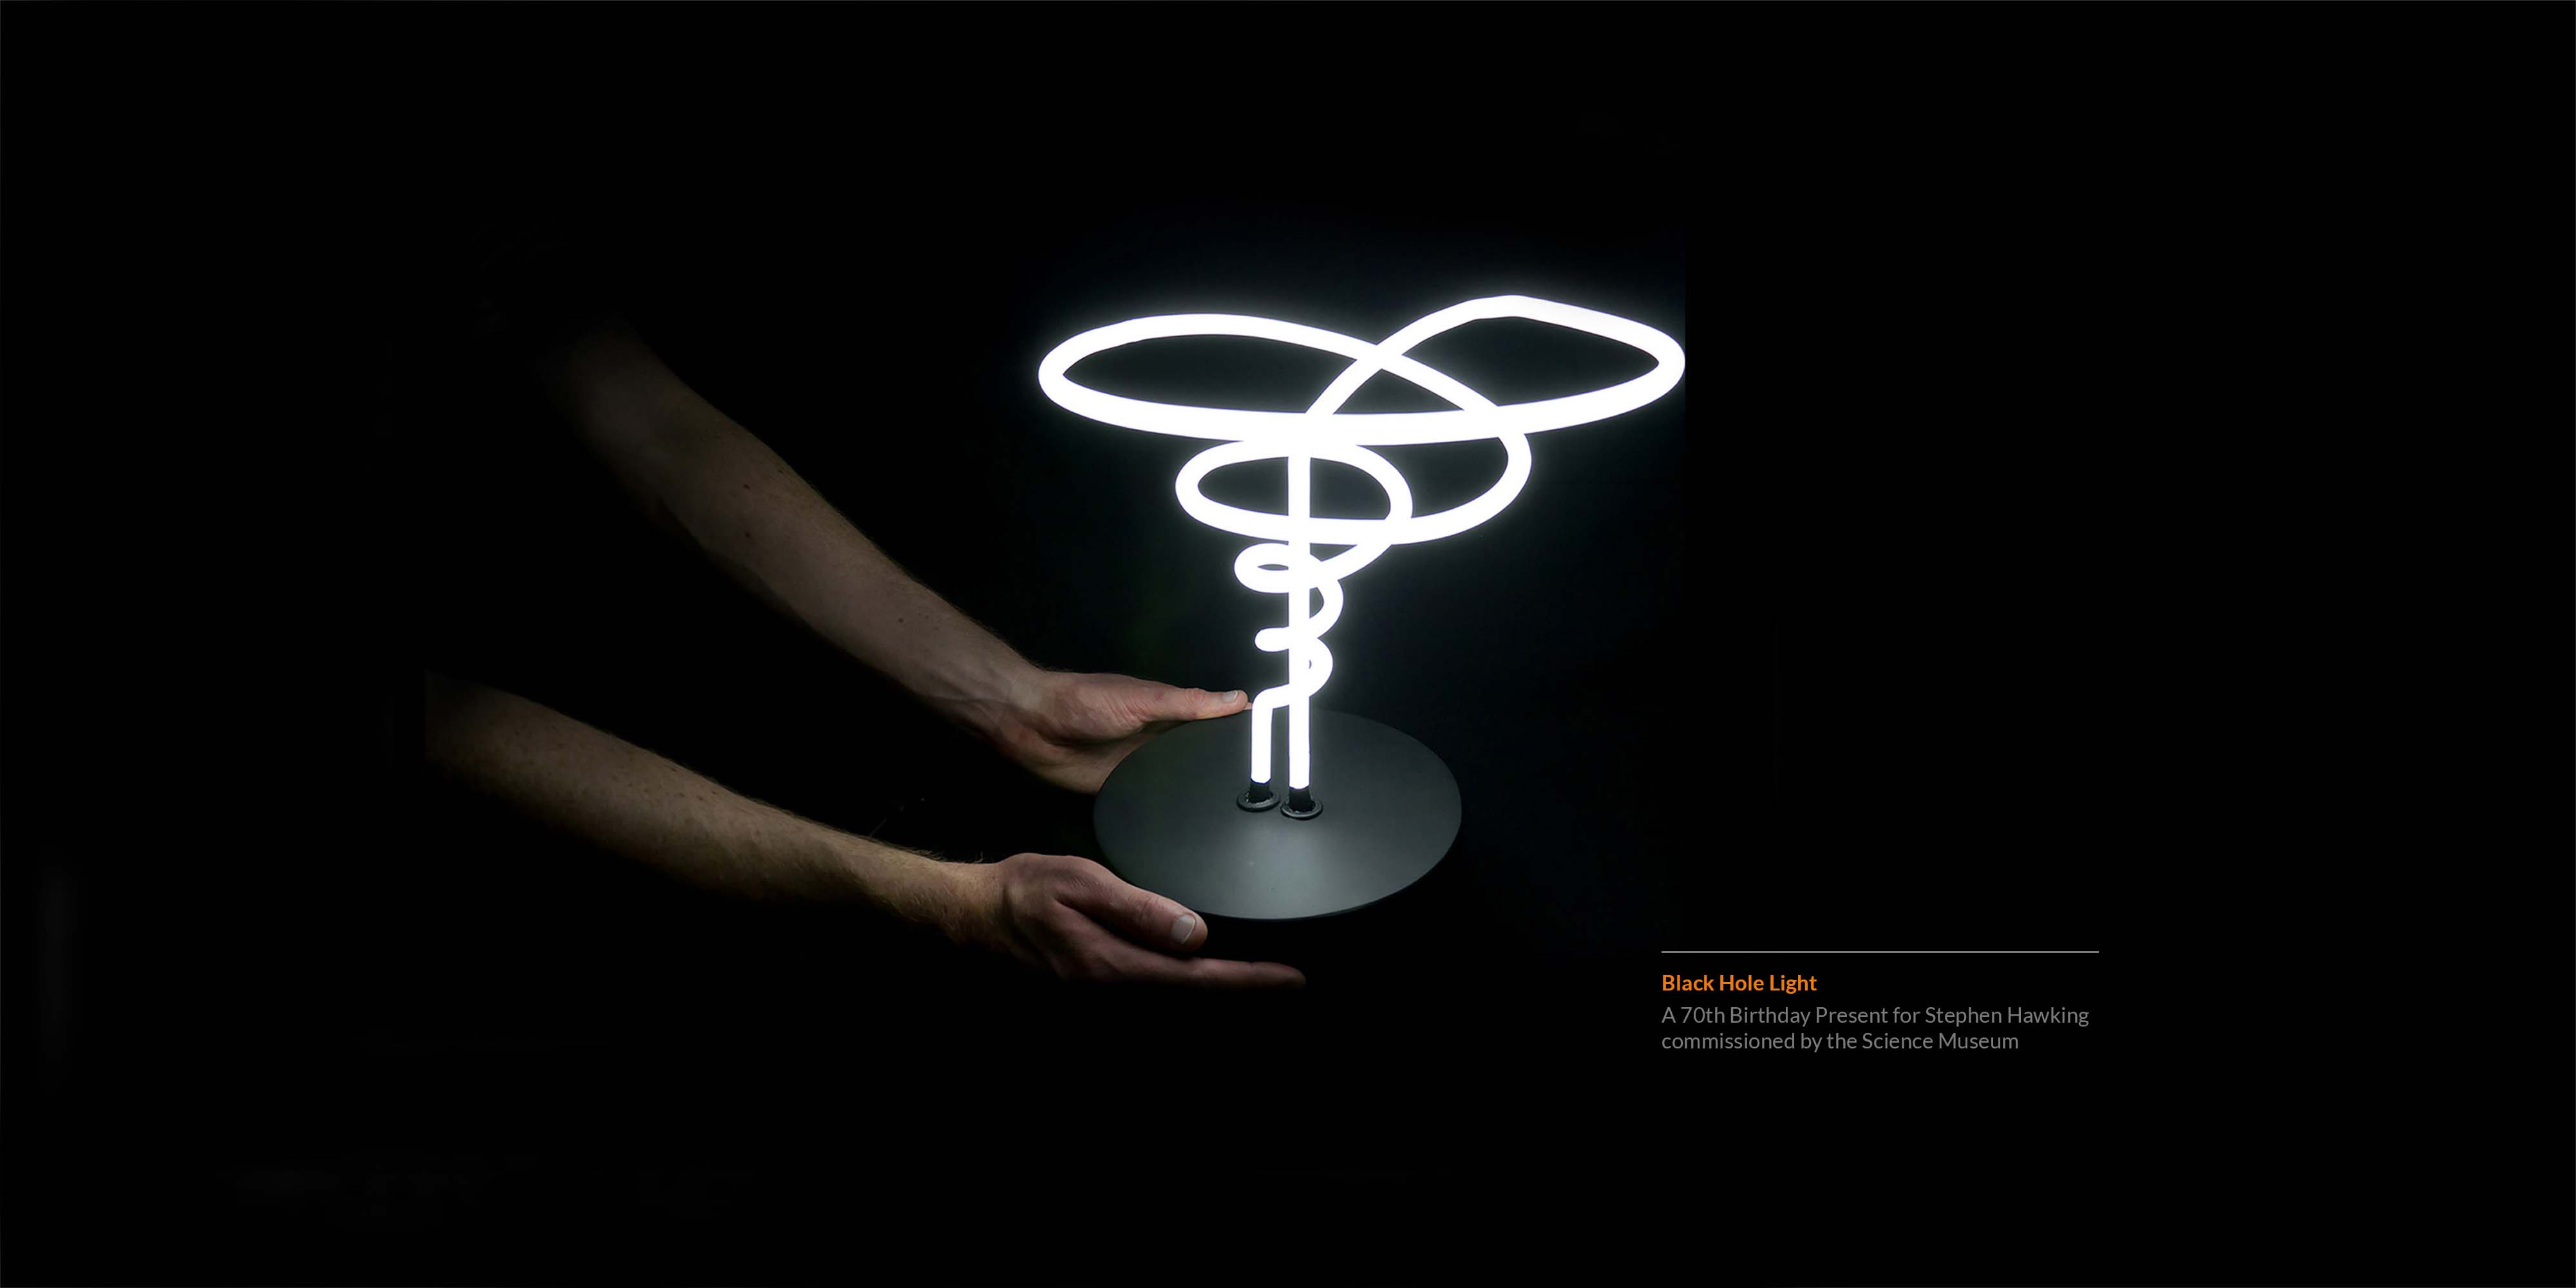 Black-Hole-Lamp-text22